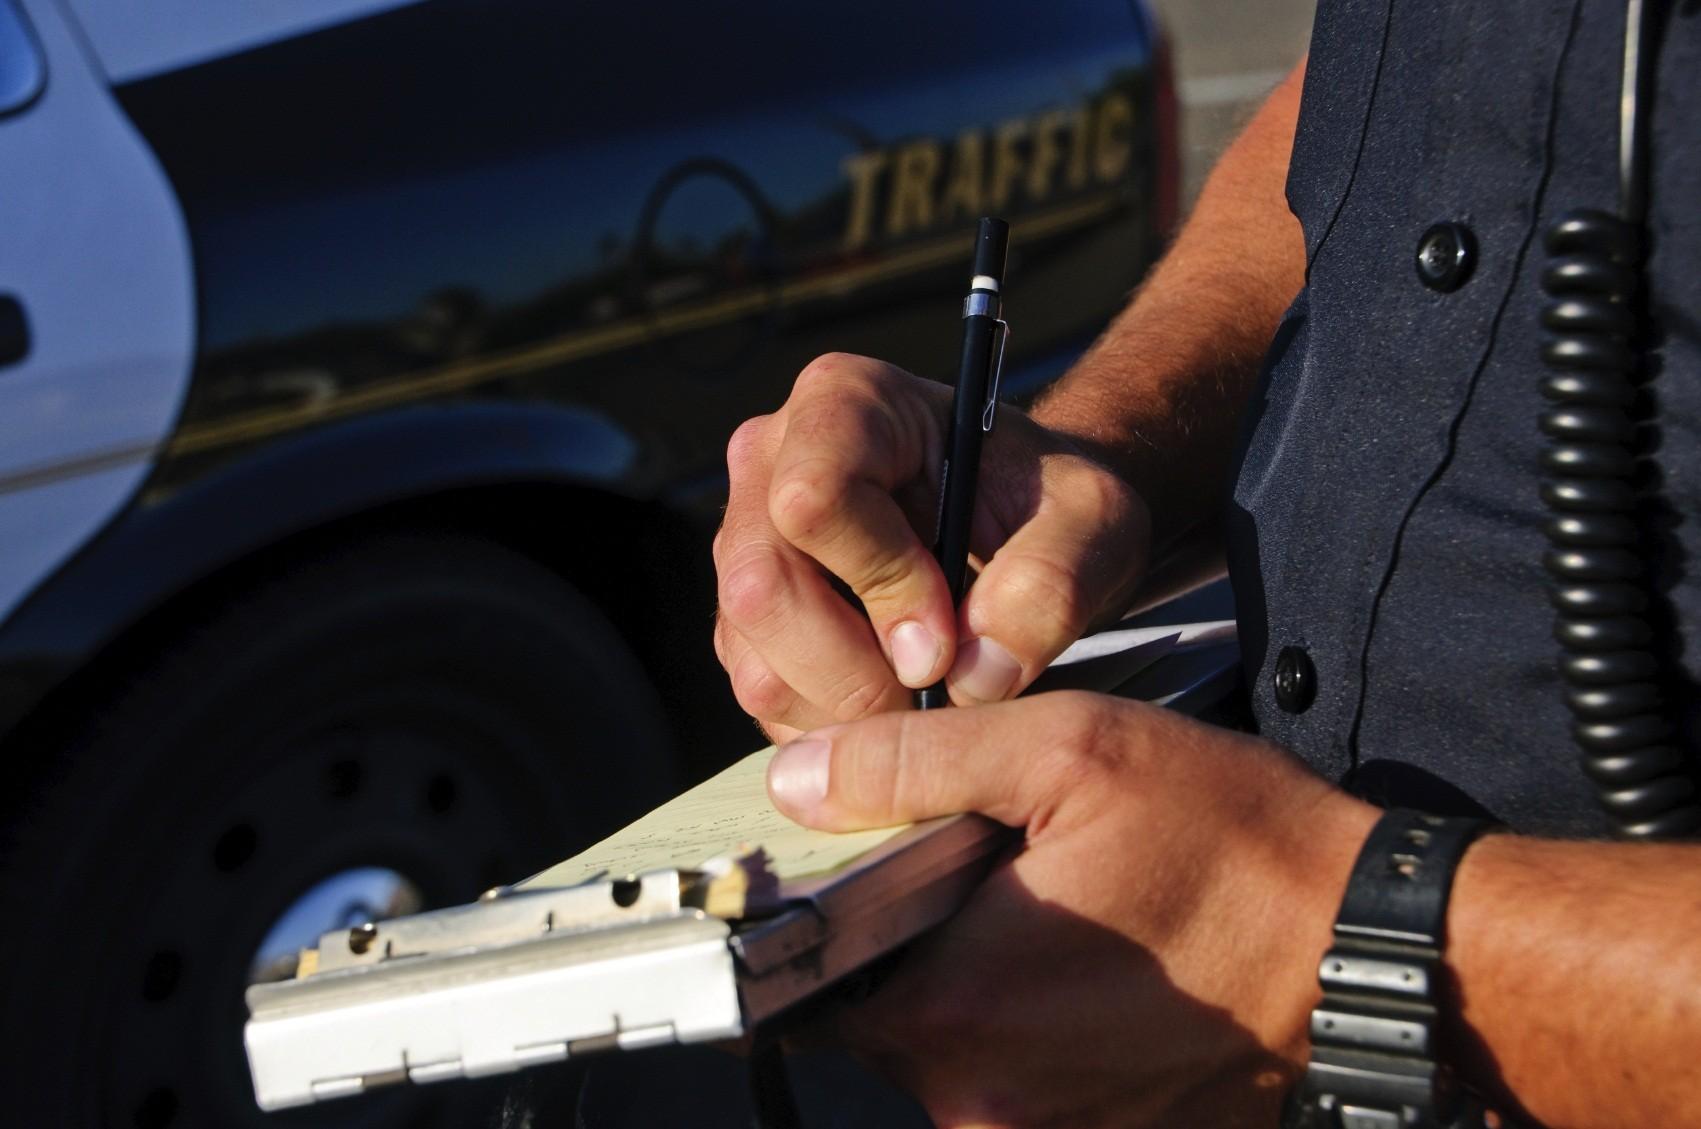 Delicious Dilemmas: Your G-SHOCK MR-G Hammertone or a speeding ticket